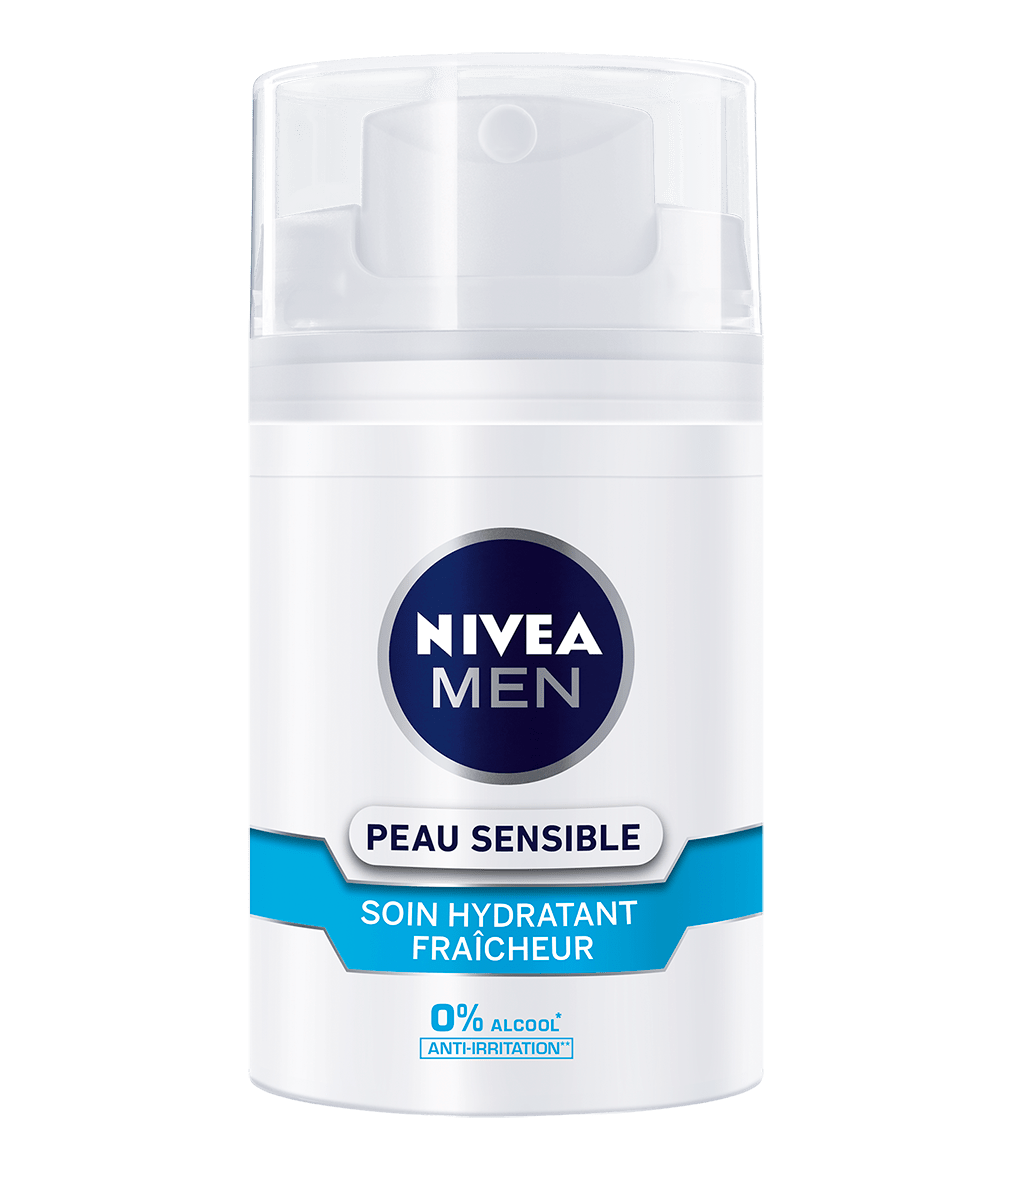 SOIN HYDRATANT FRAICHEUR PEAU SENSIBLE NIVEA MEN